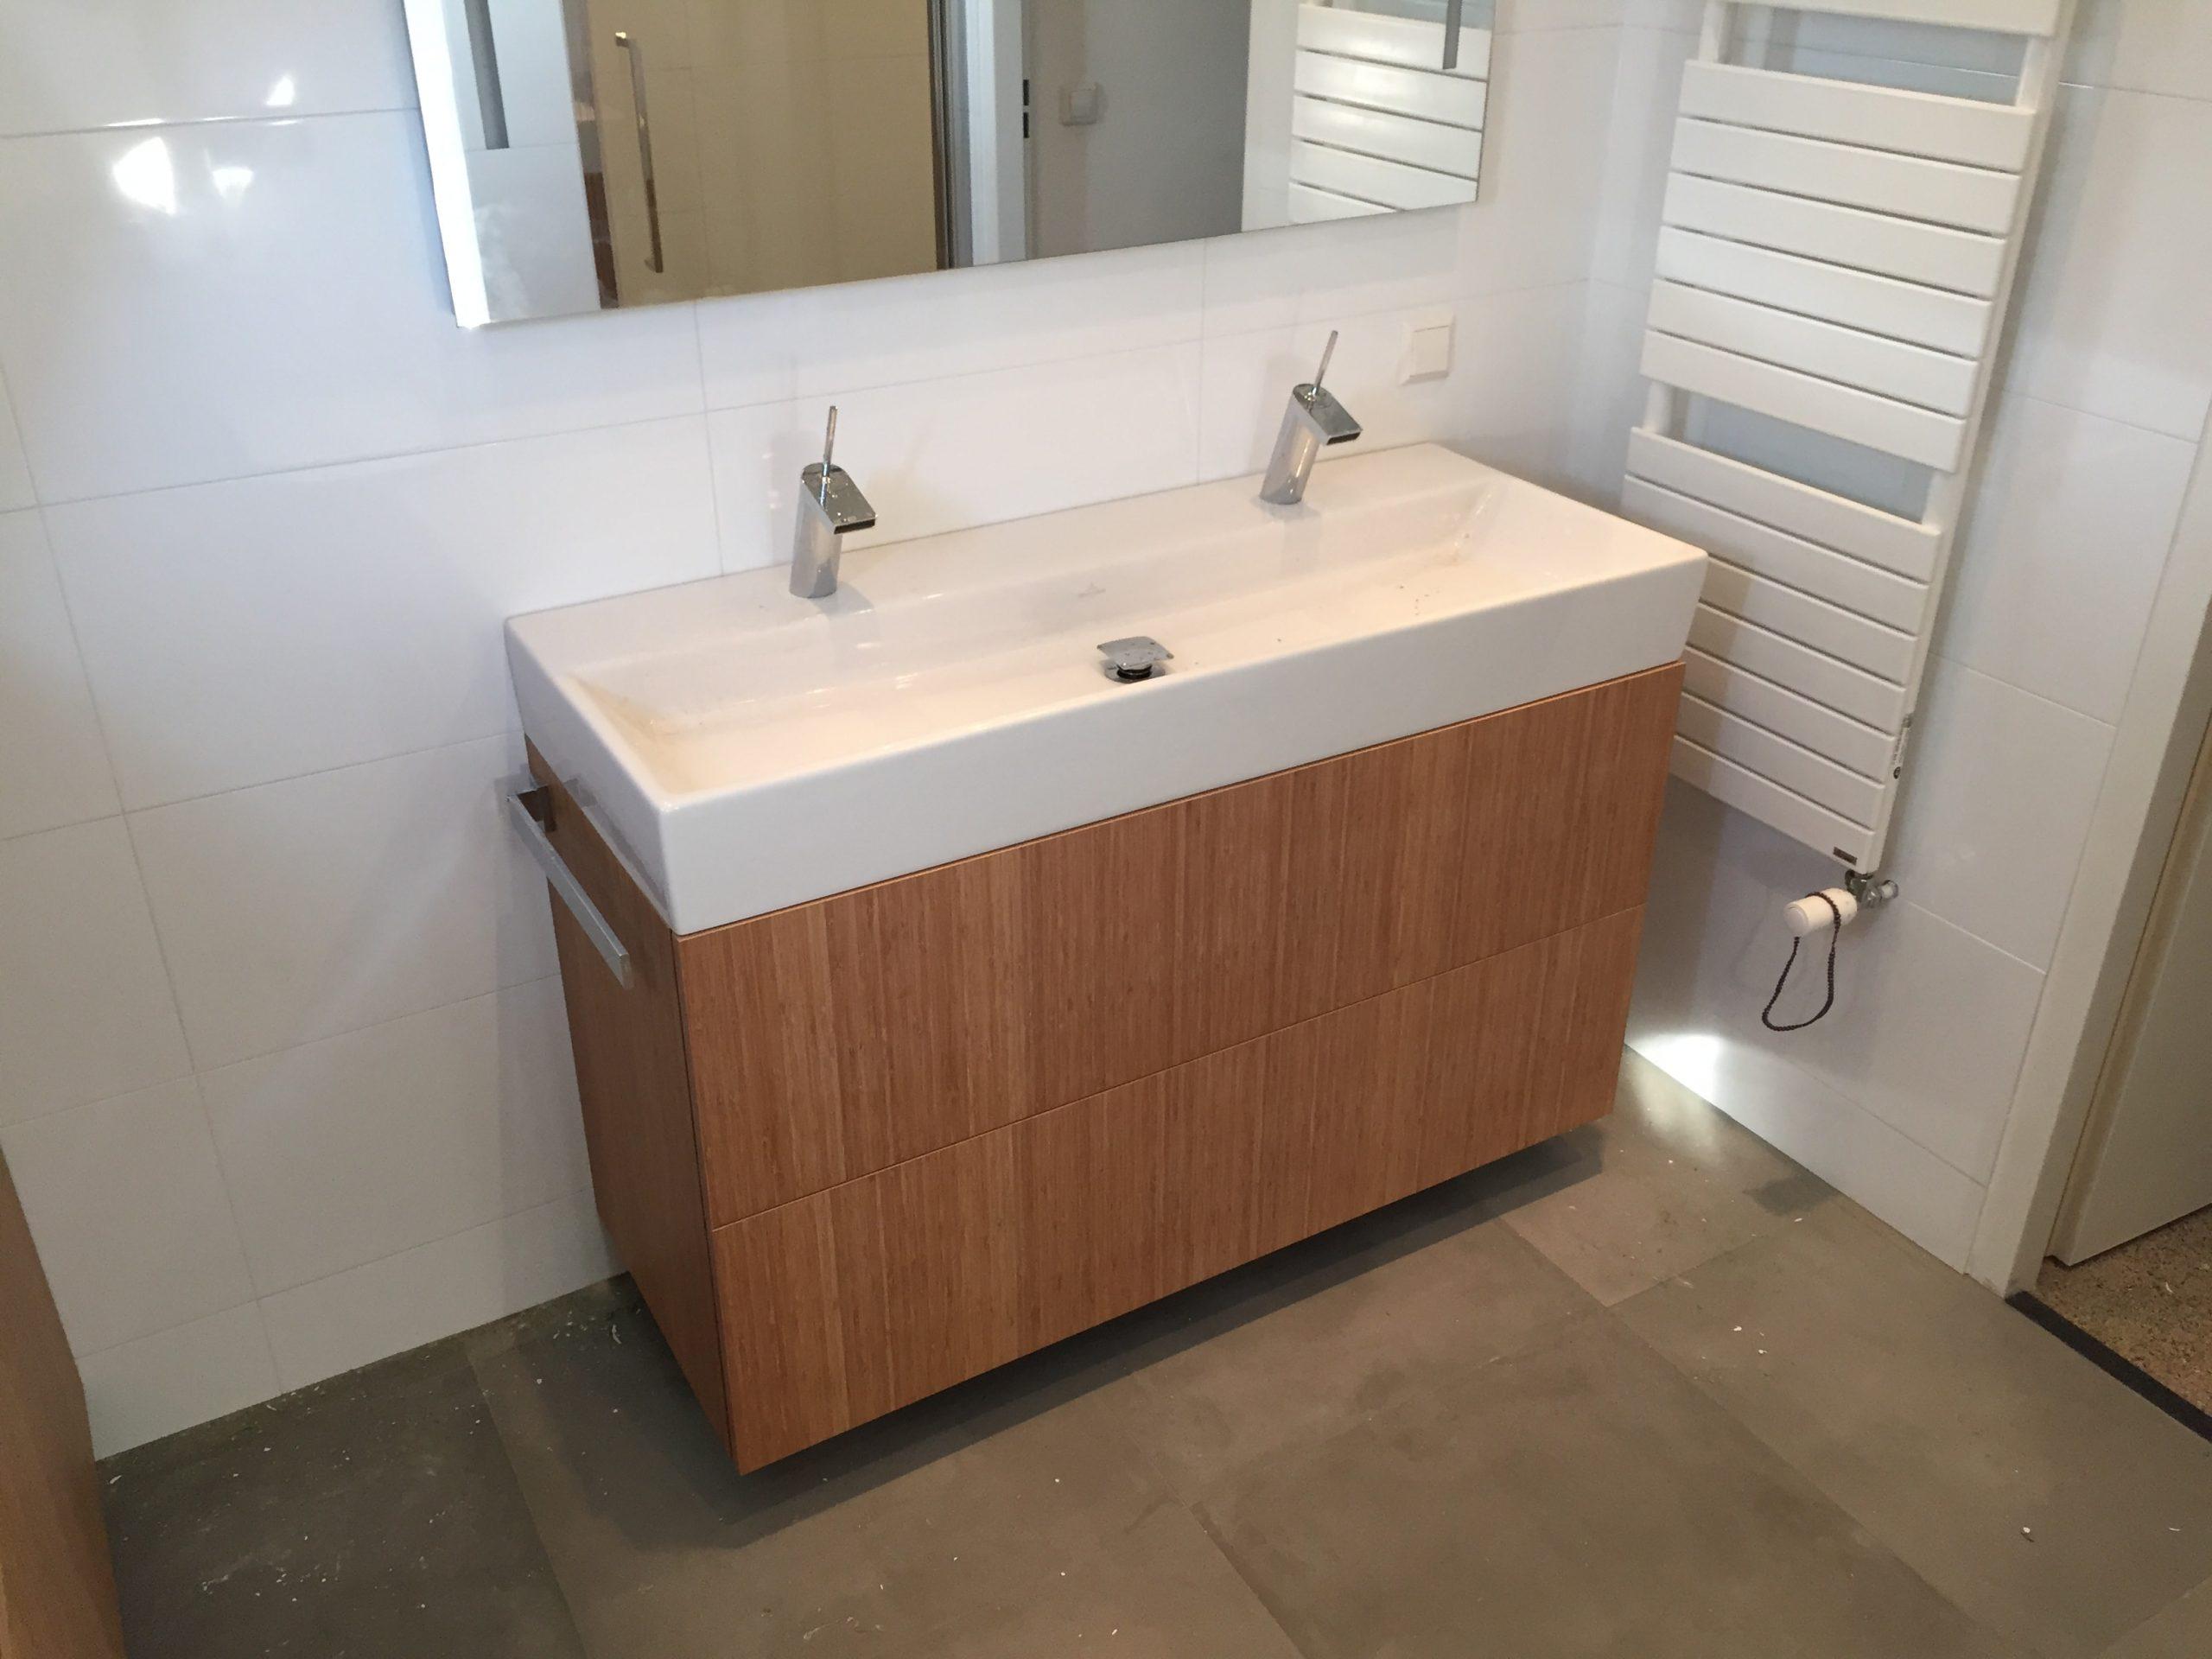 Dapri Interieurbouw - Badkamer Vijfhuizen